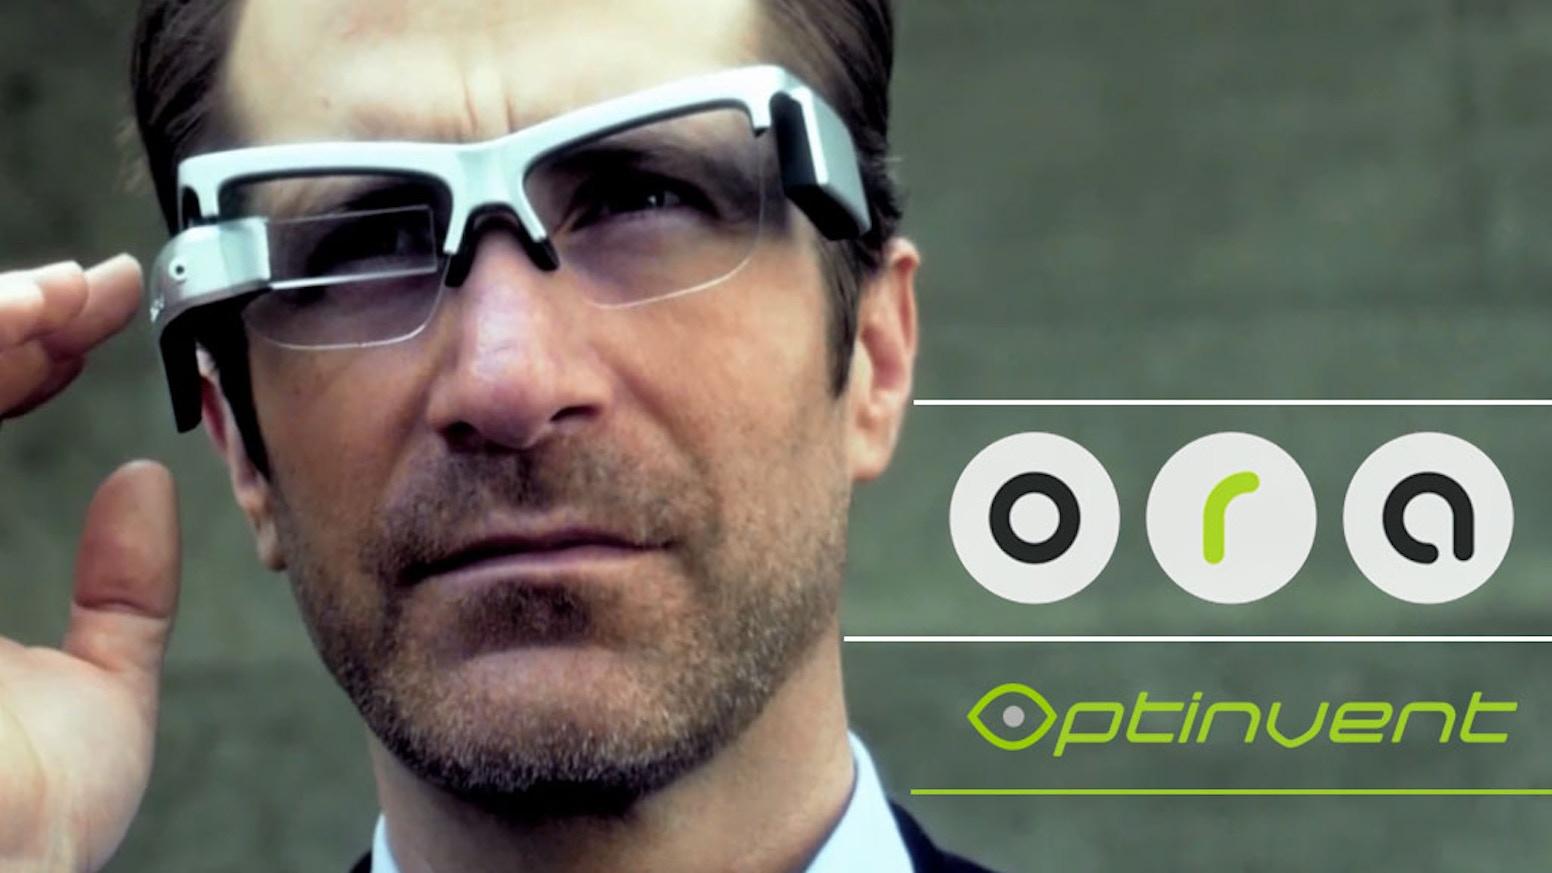 optinvent ora-2 augmented reality smart glasses